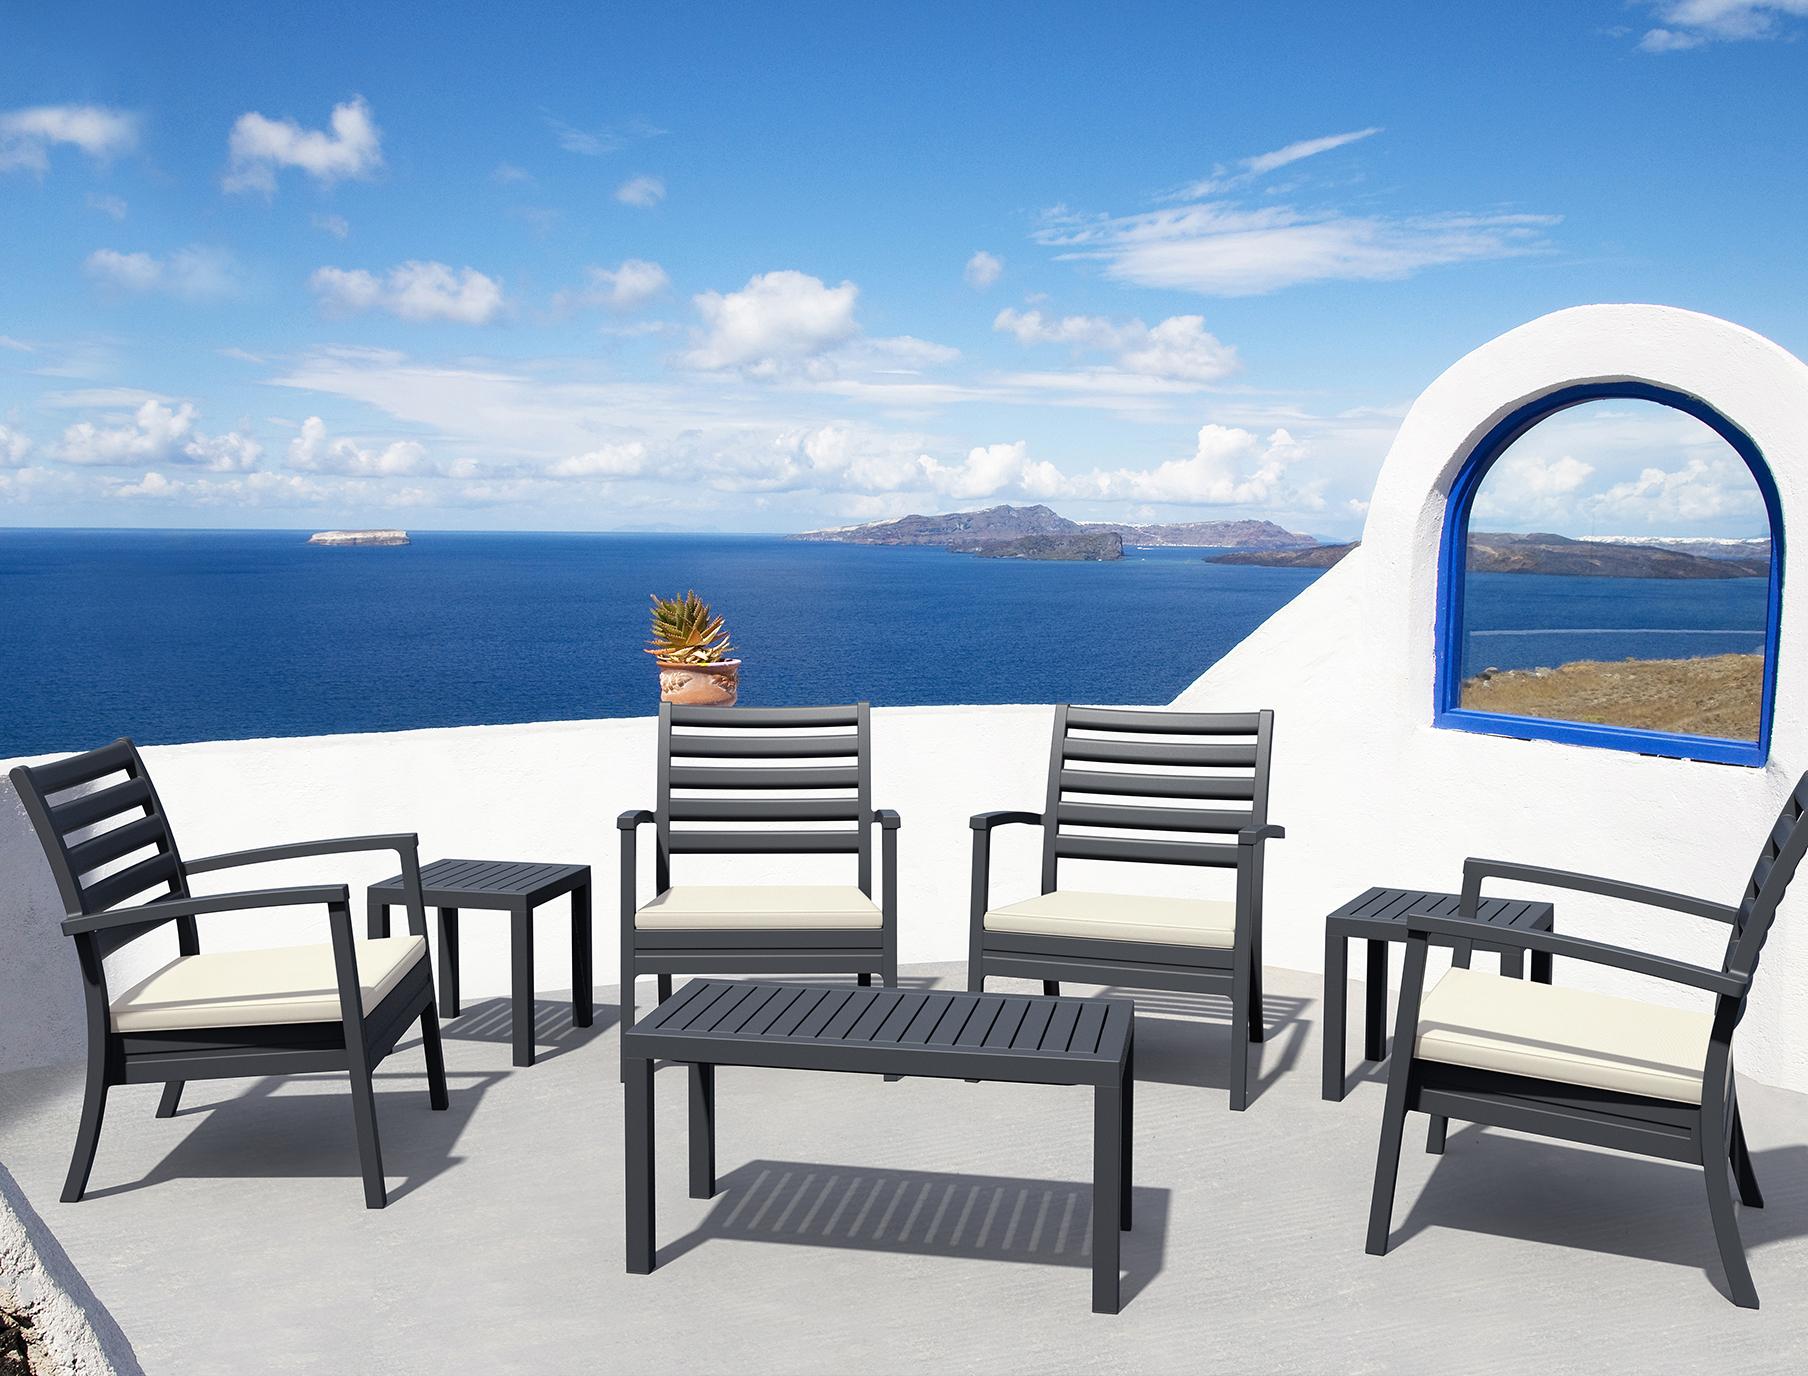 new_contract_gallery_390_artemis_xl_ocean_side_table_ocean_table@2x.jpg